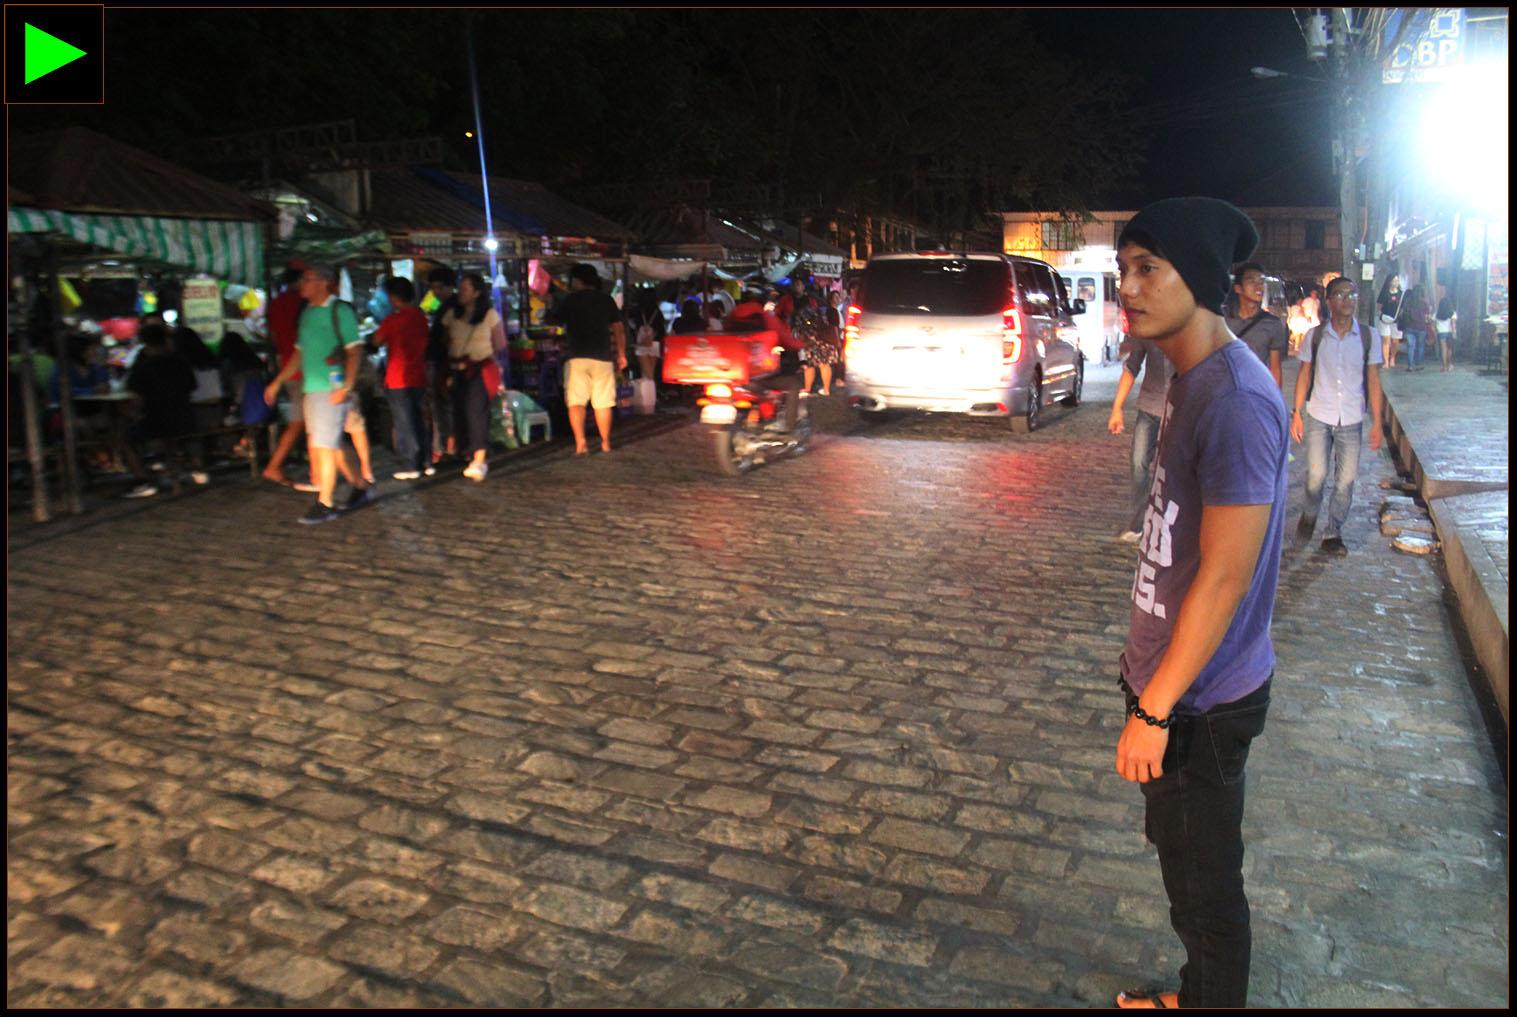 FLORENTINO STREET